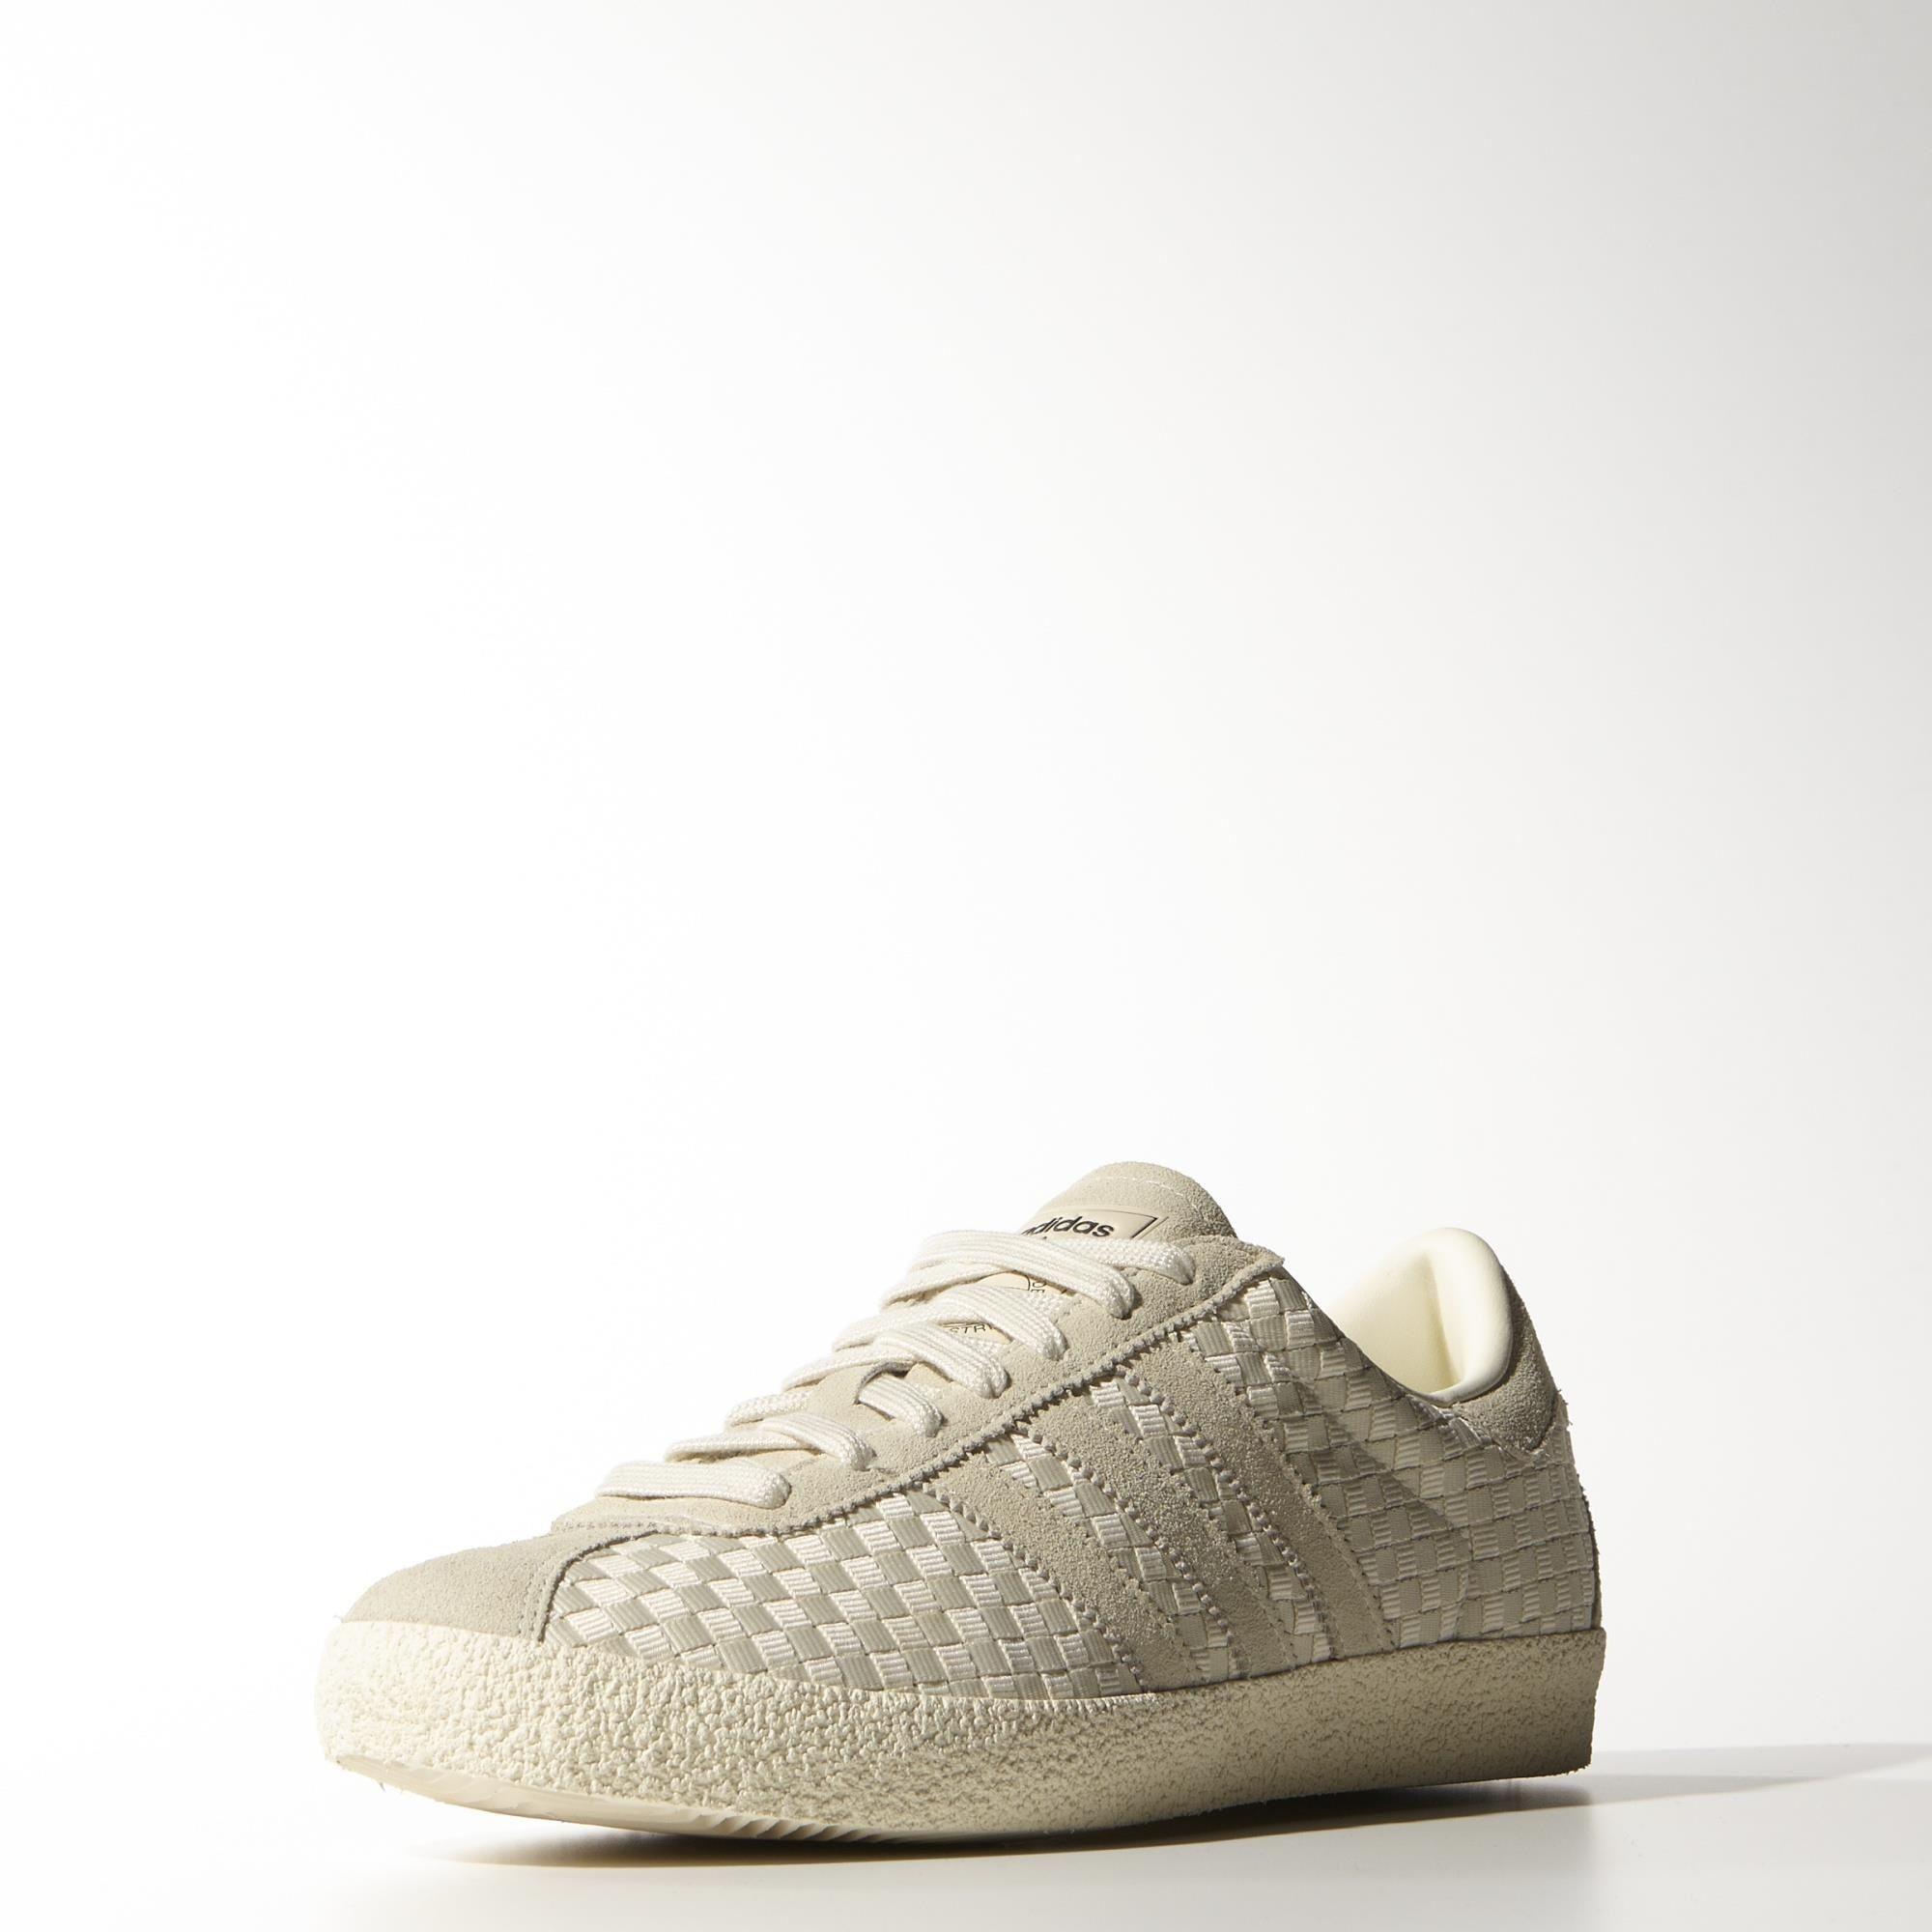 adidas - Gazelle 70s Shoes Cream White / Cream White / Core Black M19619 | Tags